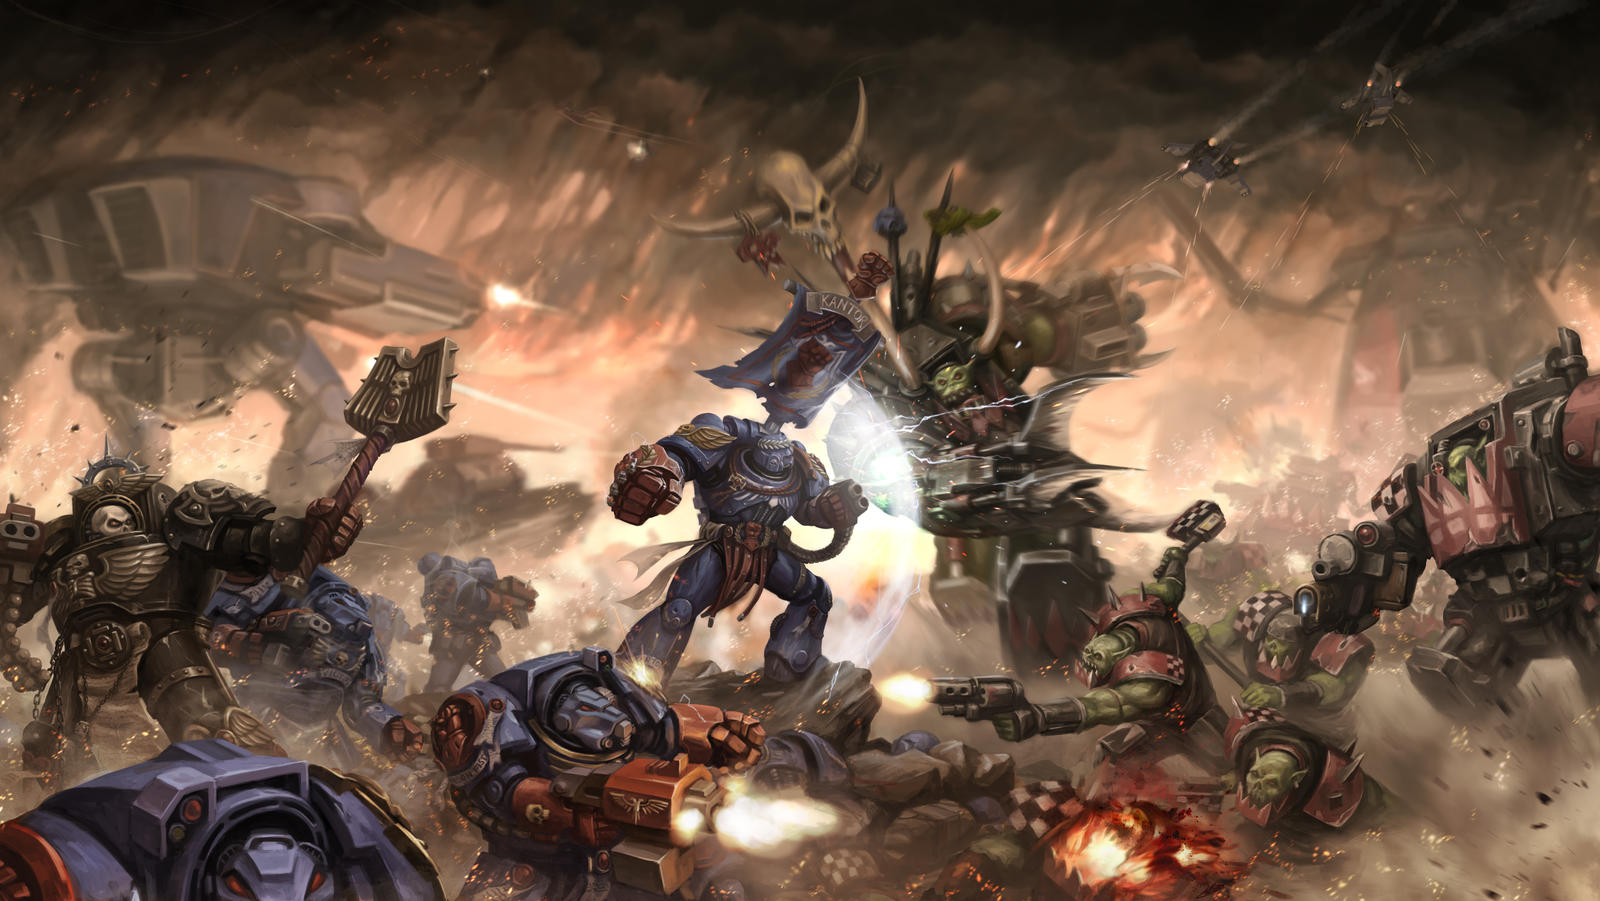 Warhammer 40k death company wallpaper - 40k By Wolfguard007